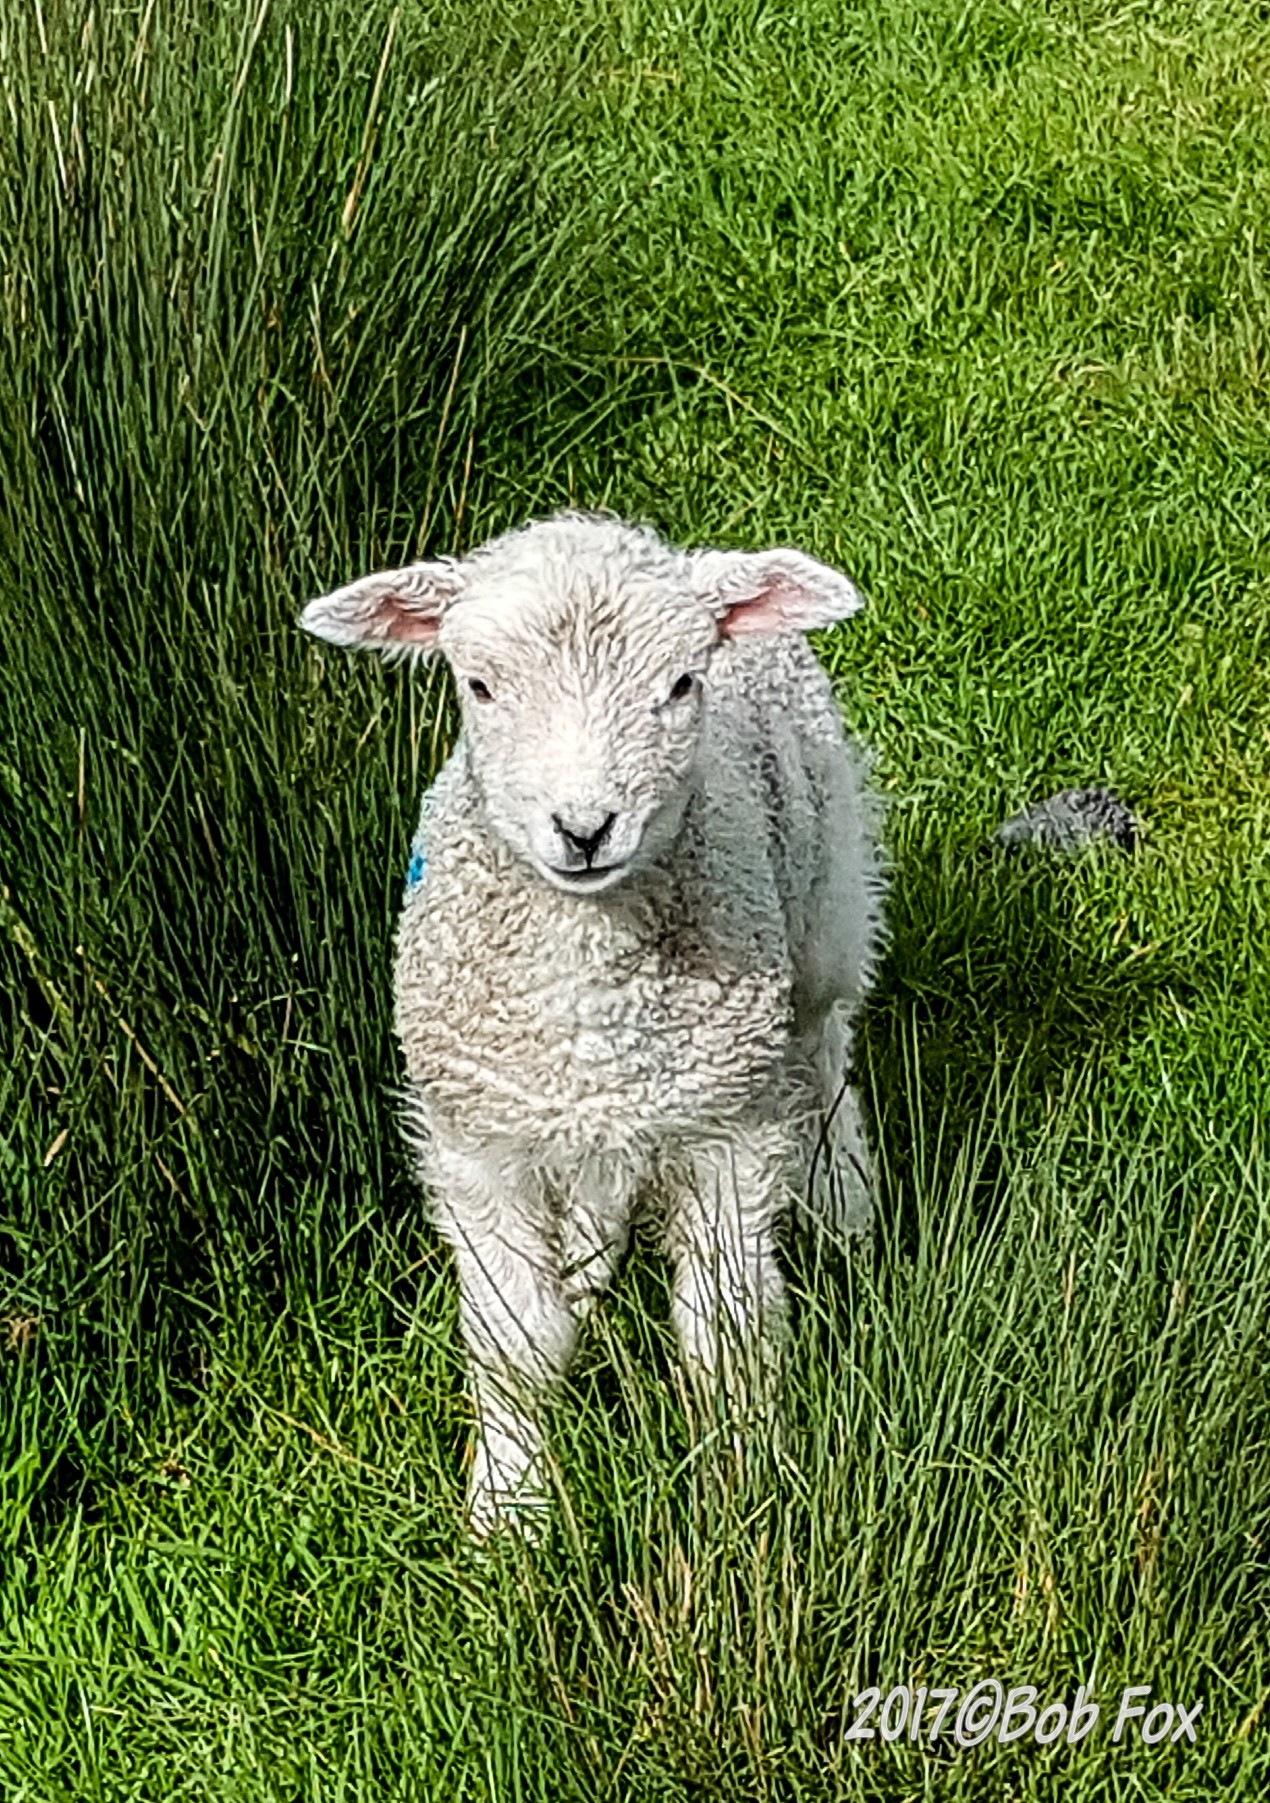 Little Lamb by Oxo123